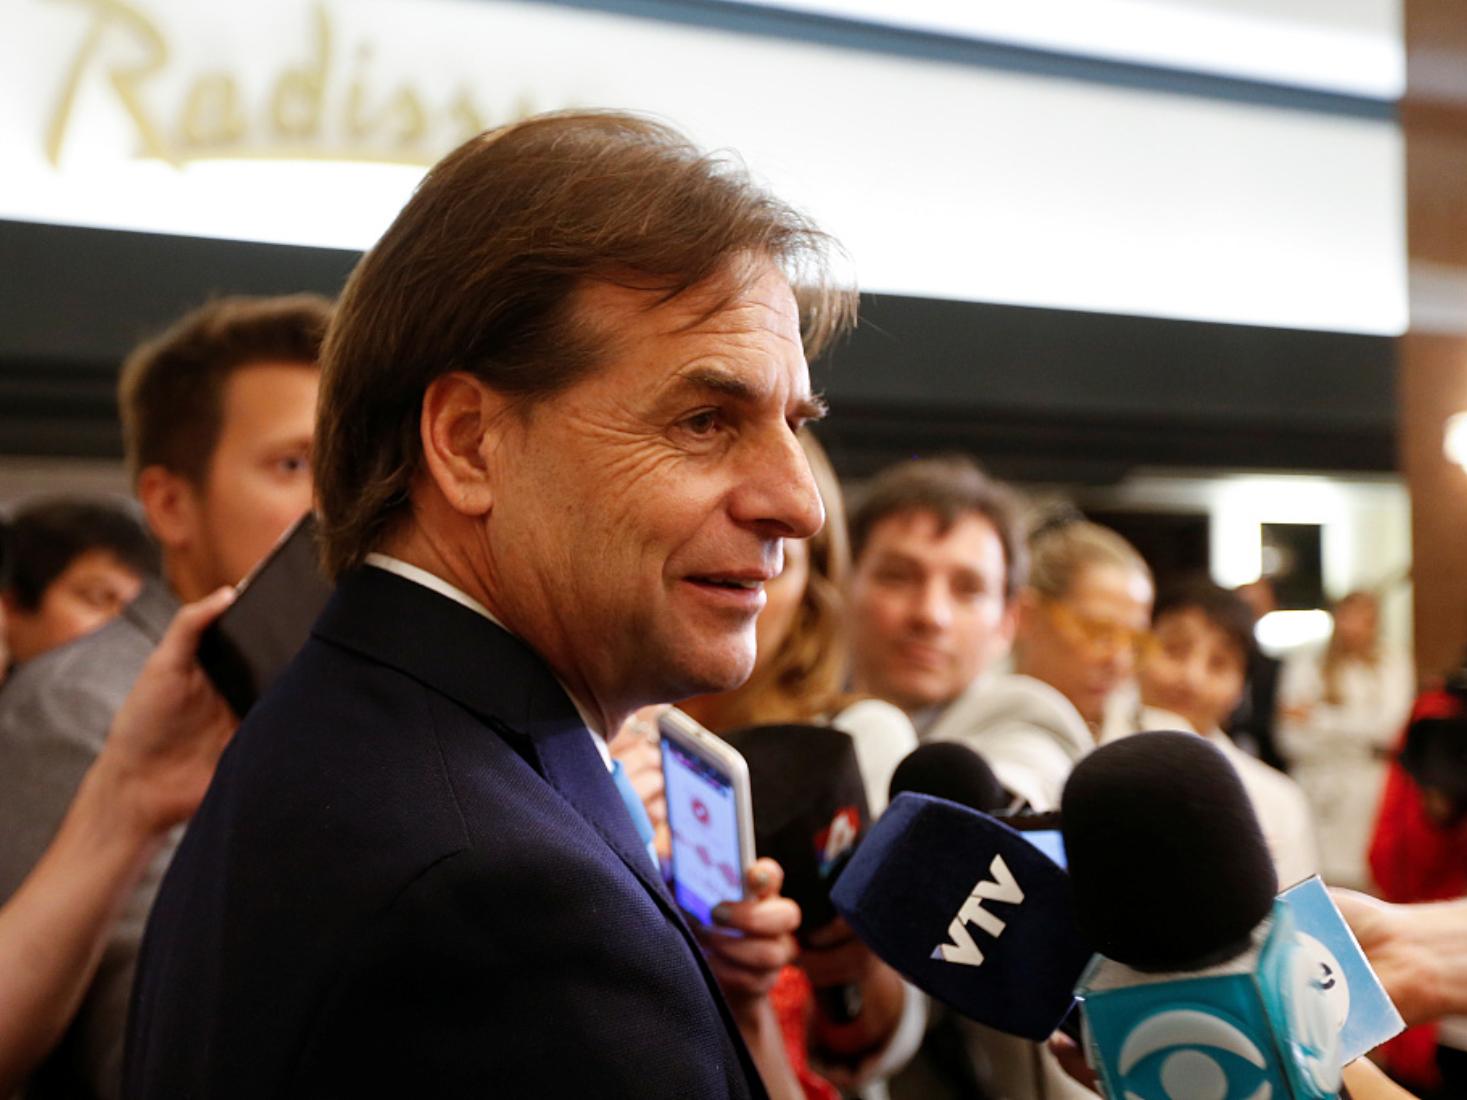 Uruguay's Electoral Court proclaims Lacalle Pou as president-elect